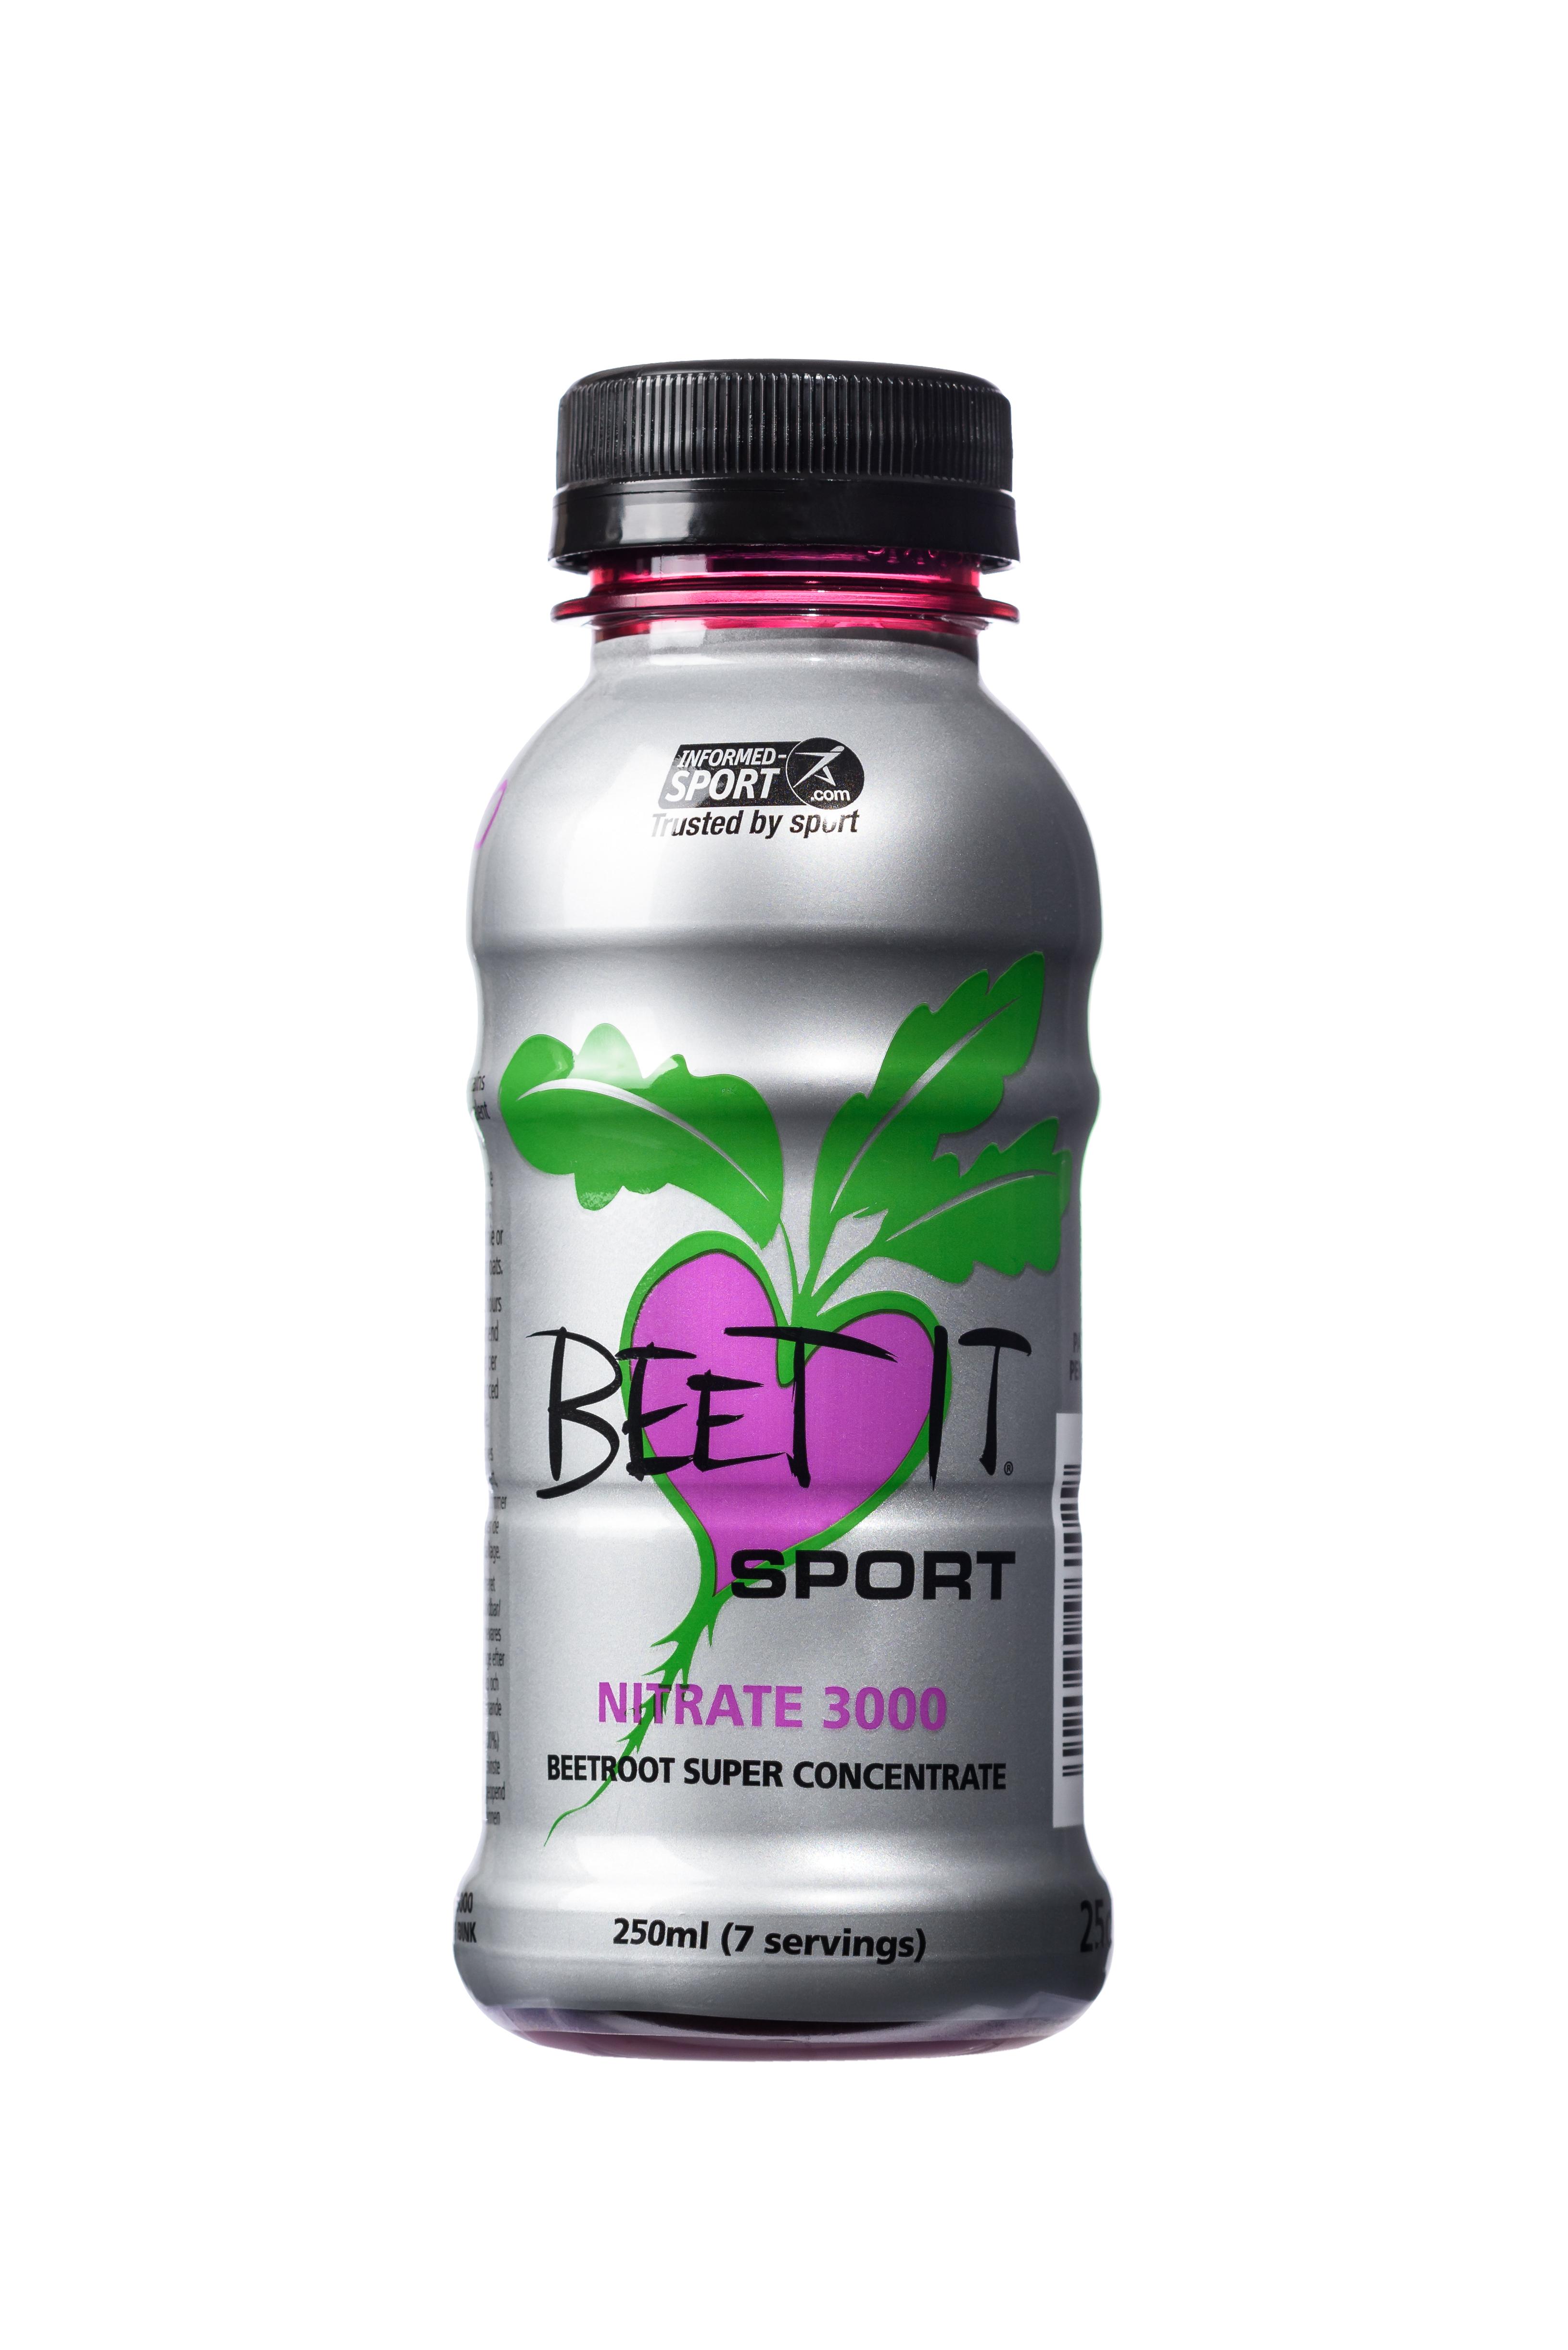 Beet-It Nitrate 3000